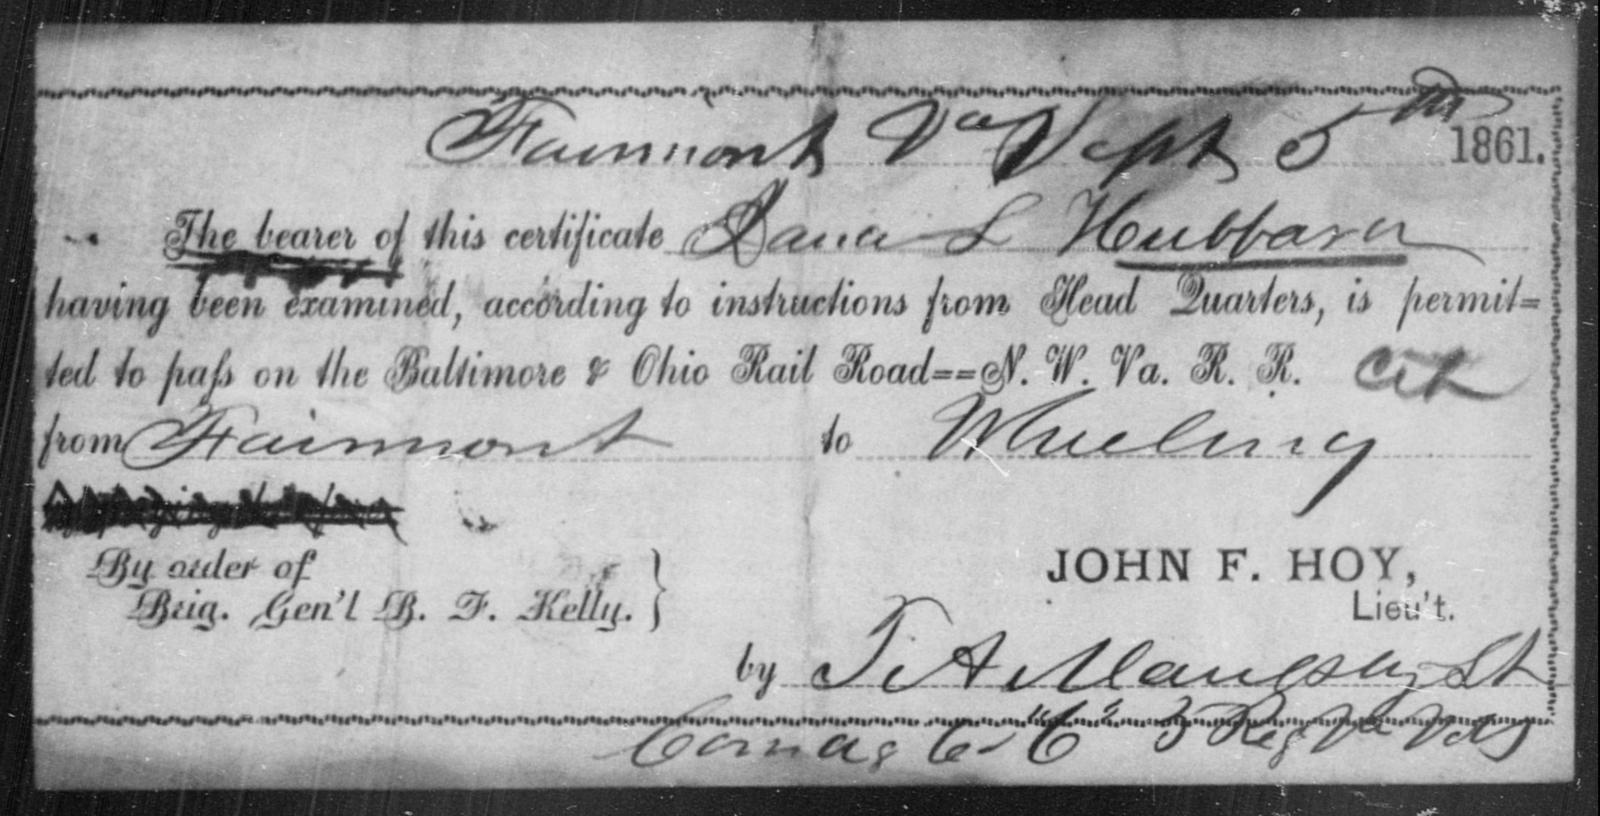 Hubbard, Jana L - State: Ohio - Year: 1861